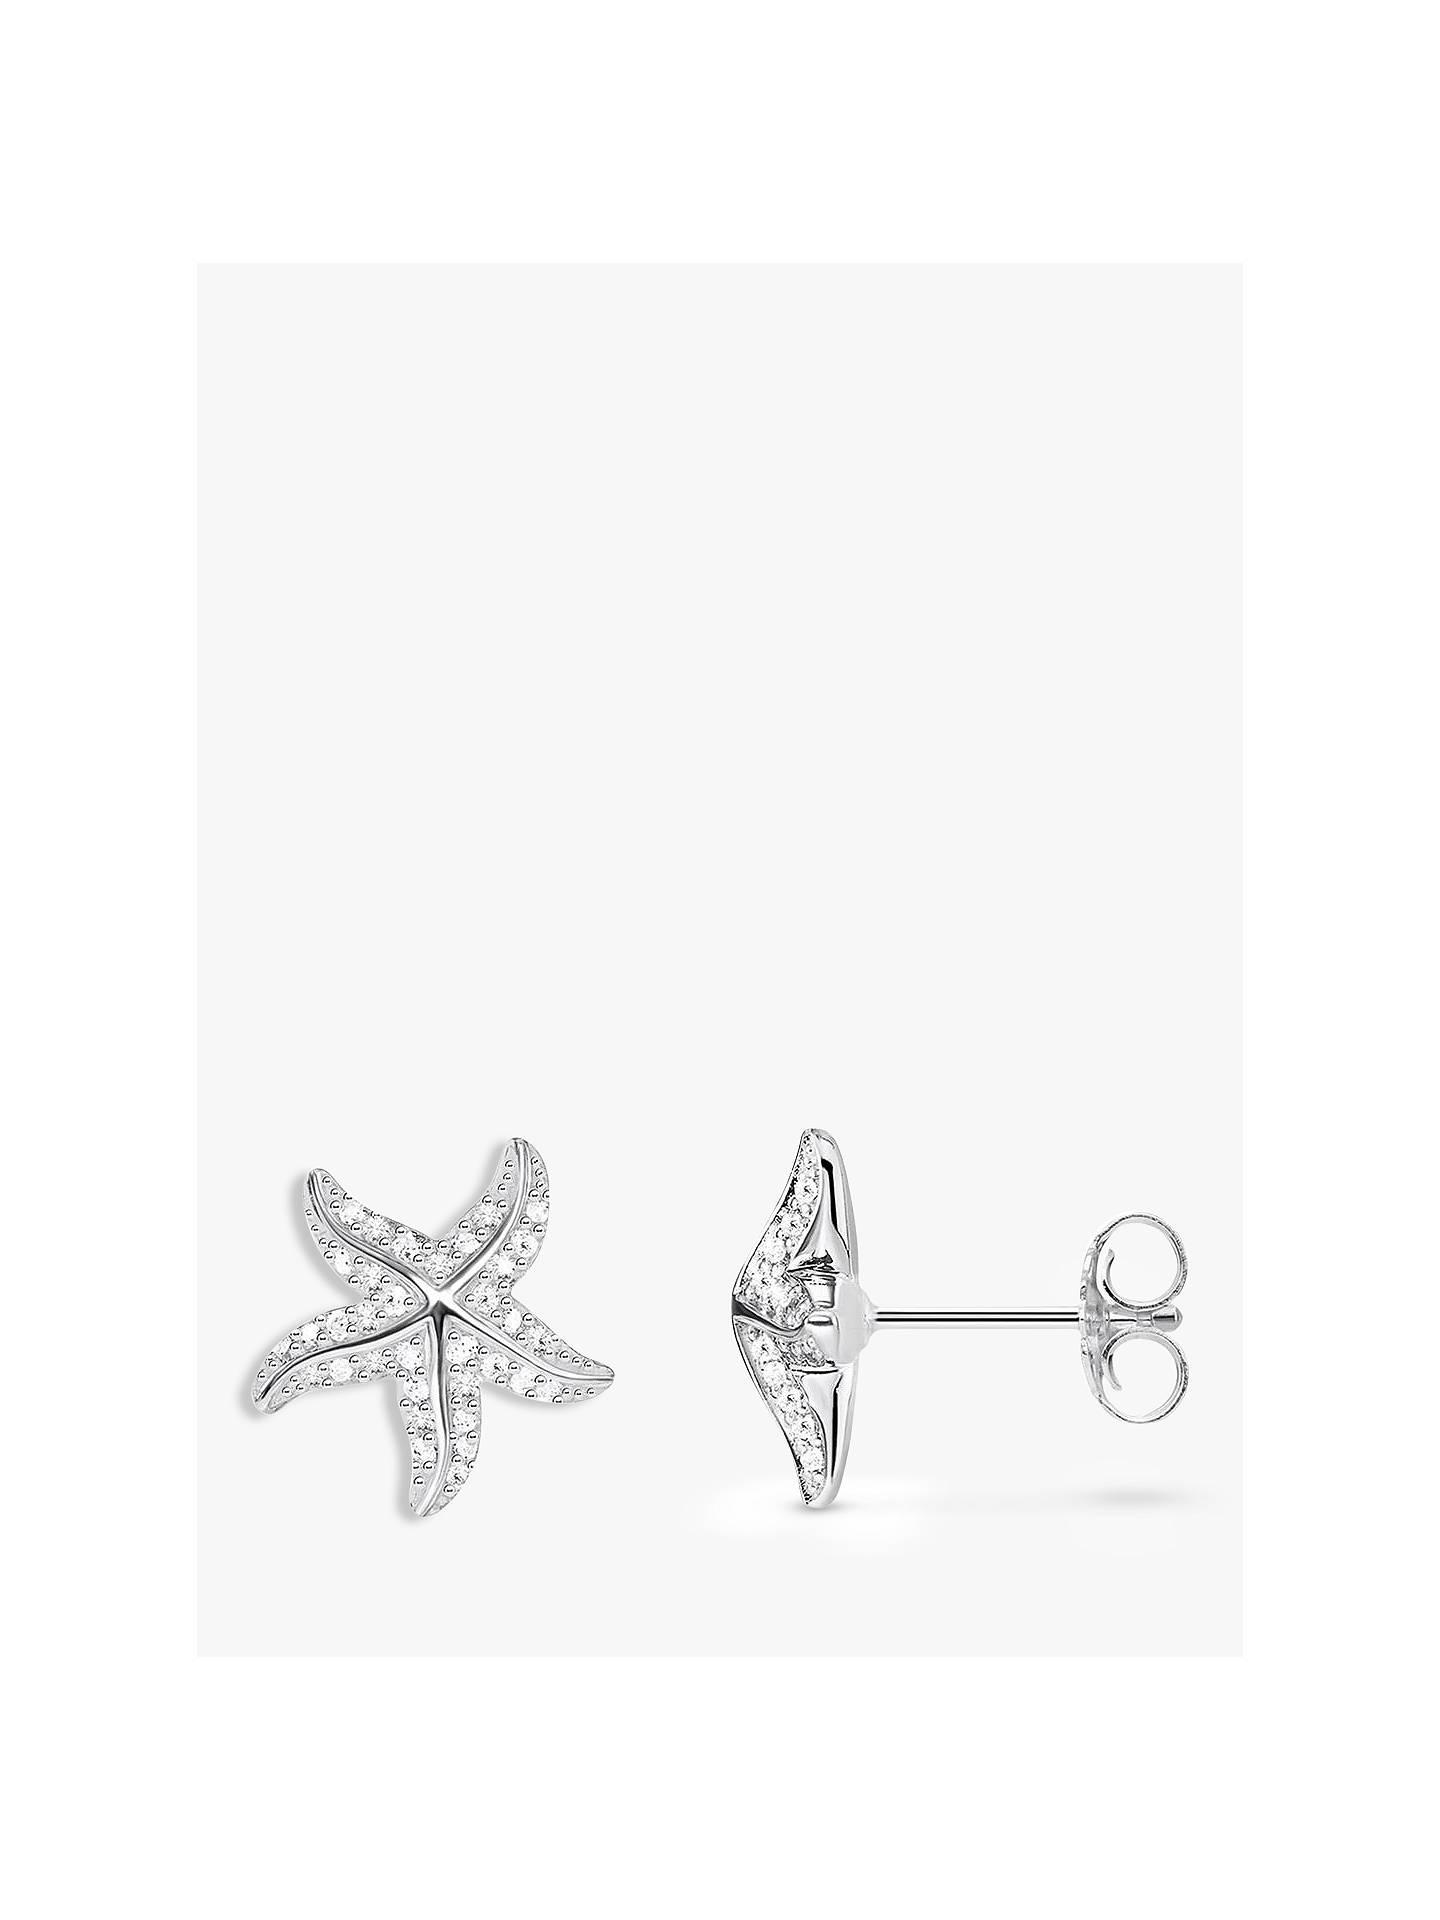 Thomas Sabo Cubic Zirconia Starfish Stud Earrings Silver Online At Johnlewis